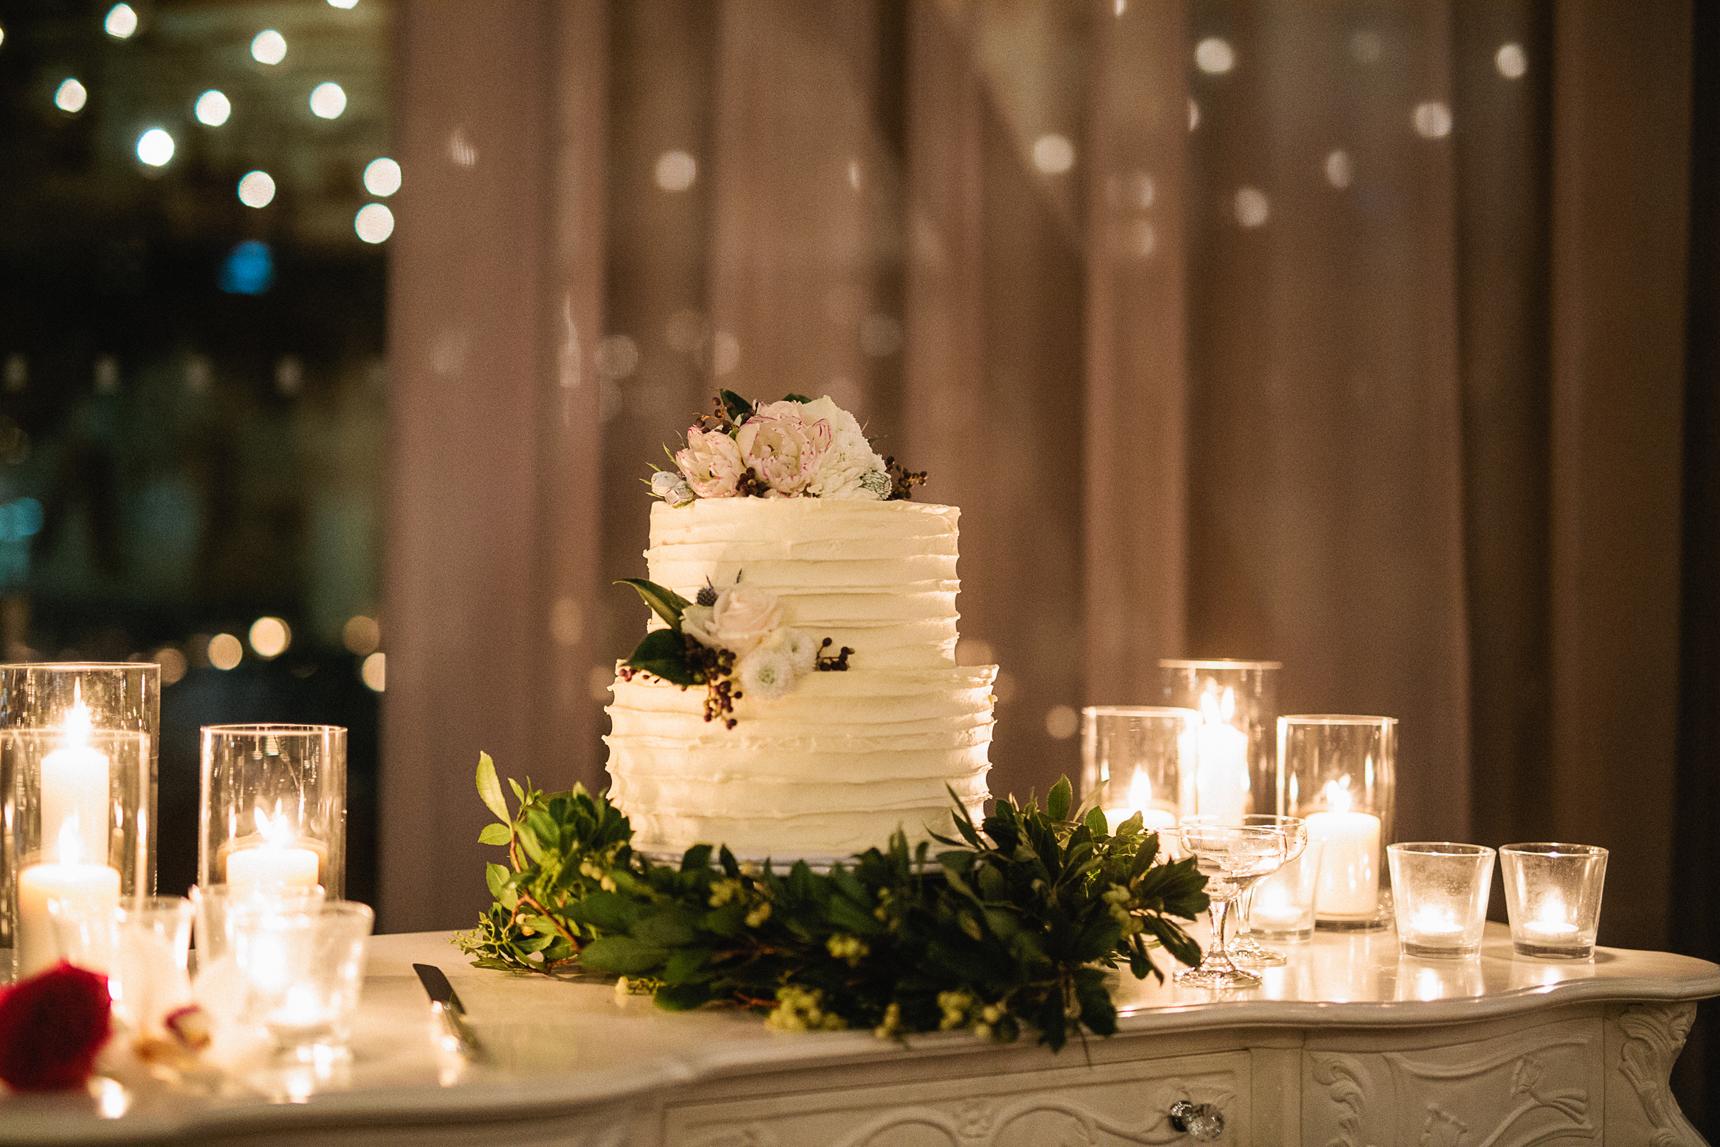 GregLana_ViewBySydney_WeddingPhotography073.jpg